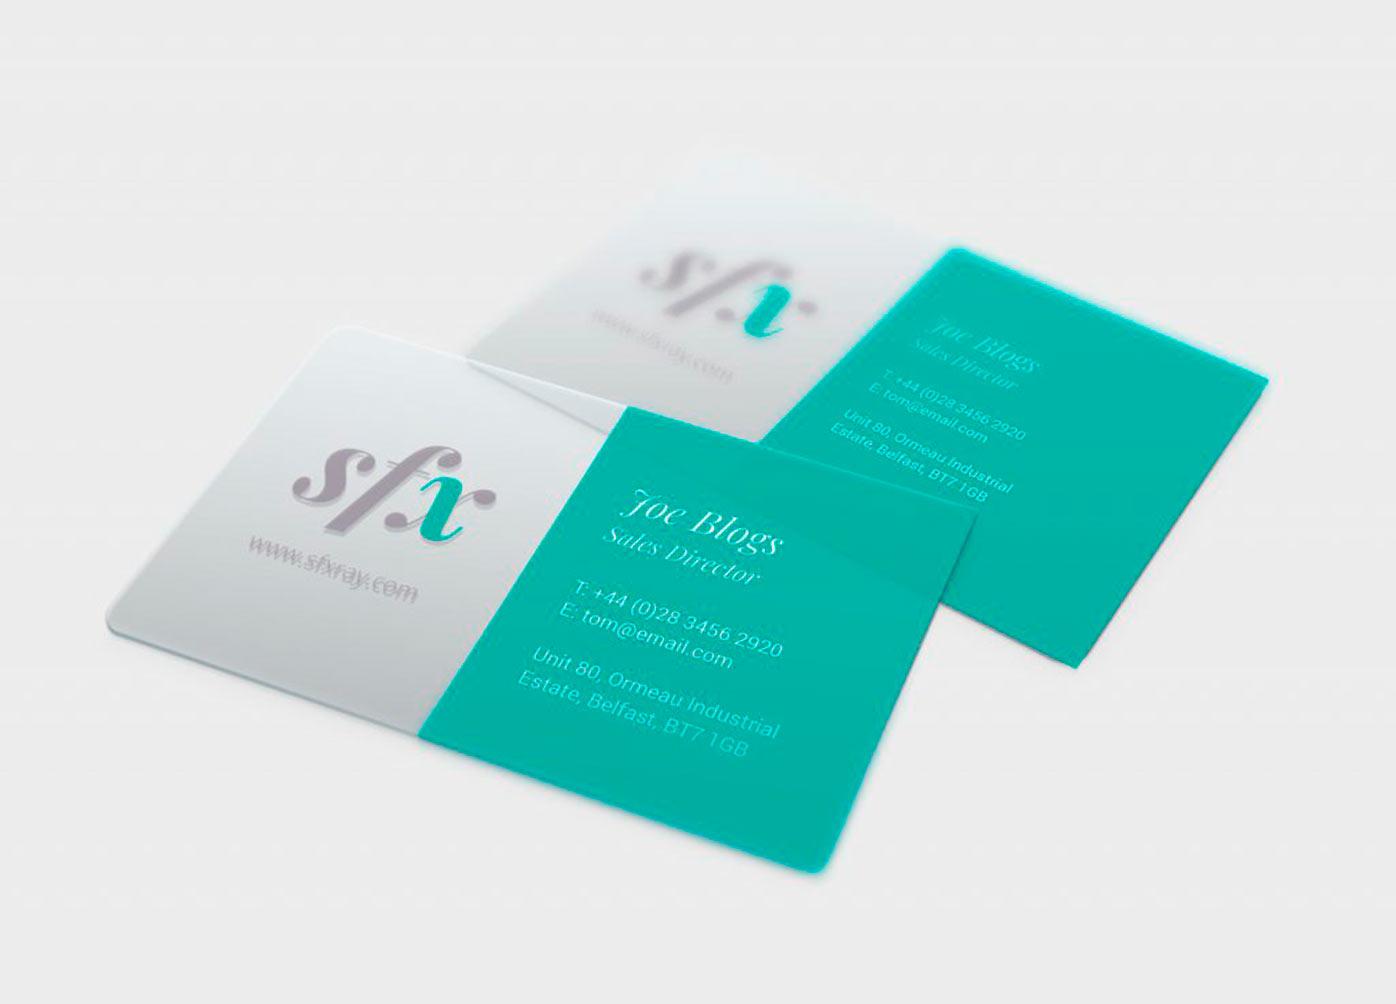 SFX cards